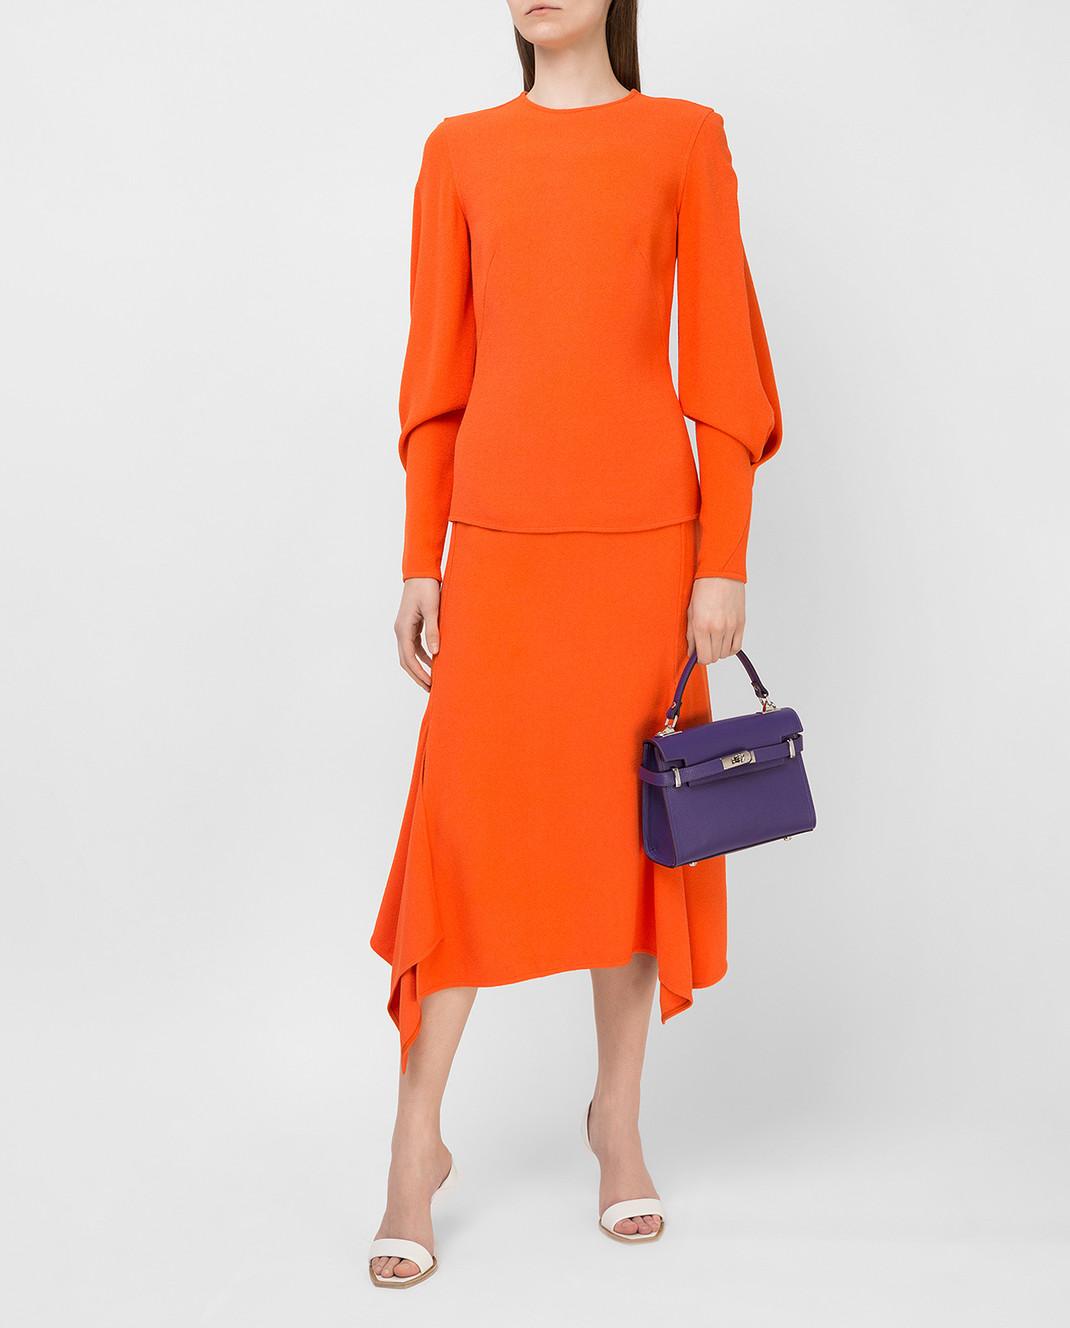 Victoria Beckham Оранжевая блуза TPLNG1339 изображение 2